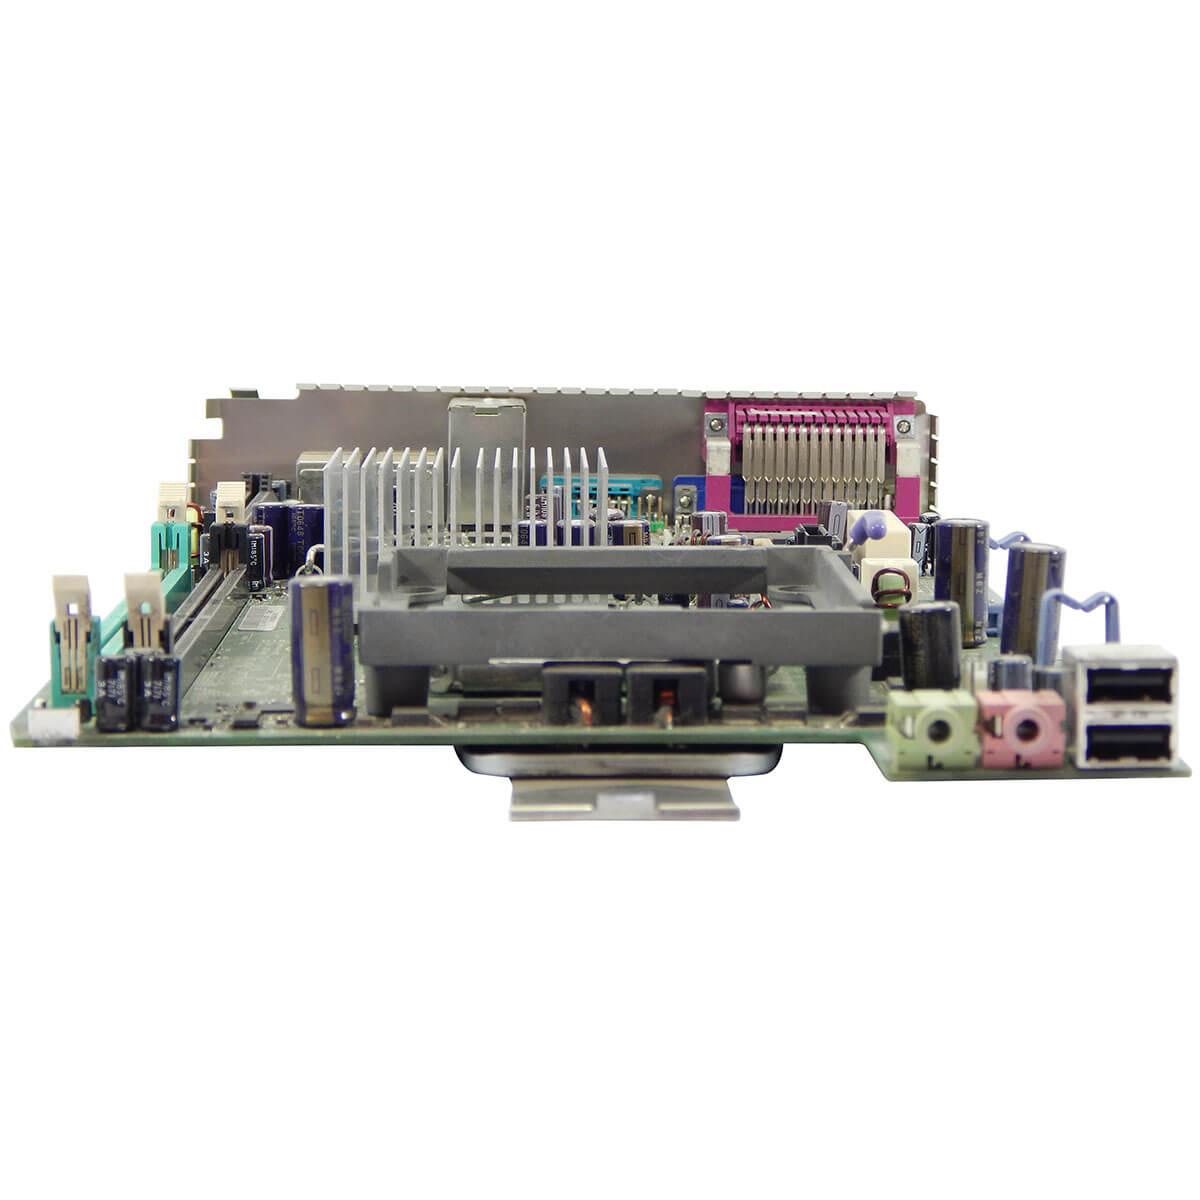 Placa Mãe IBM Lenovo ThinkCentre A55 / M55 LGA775